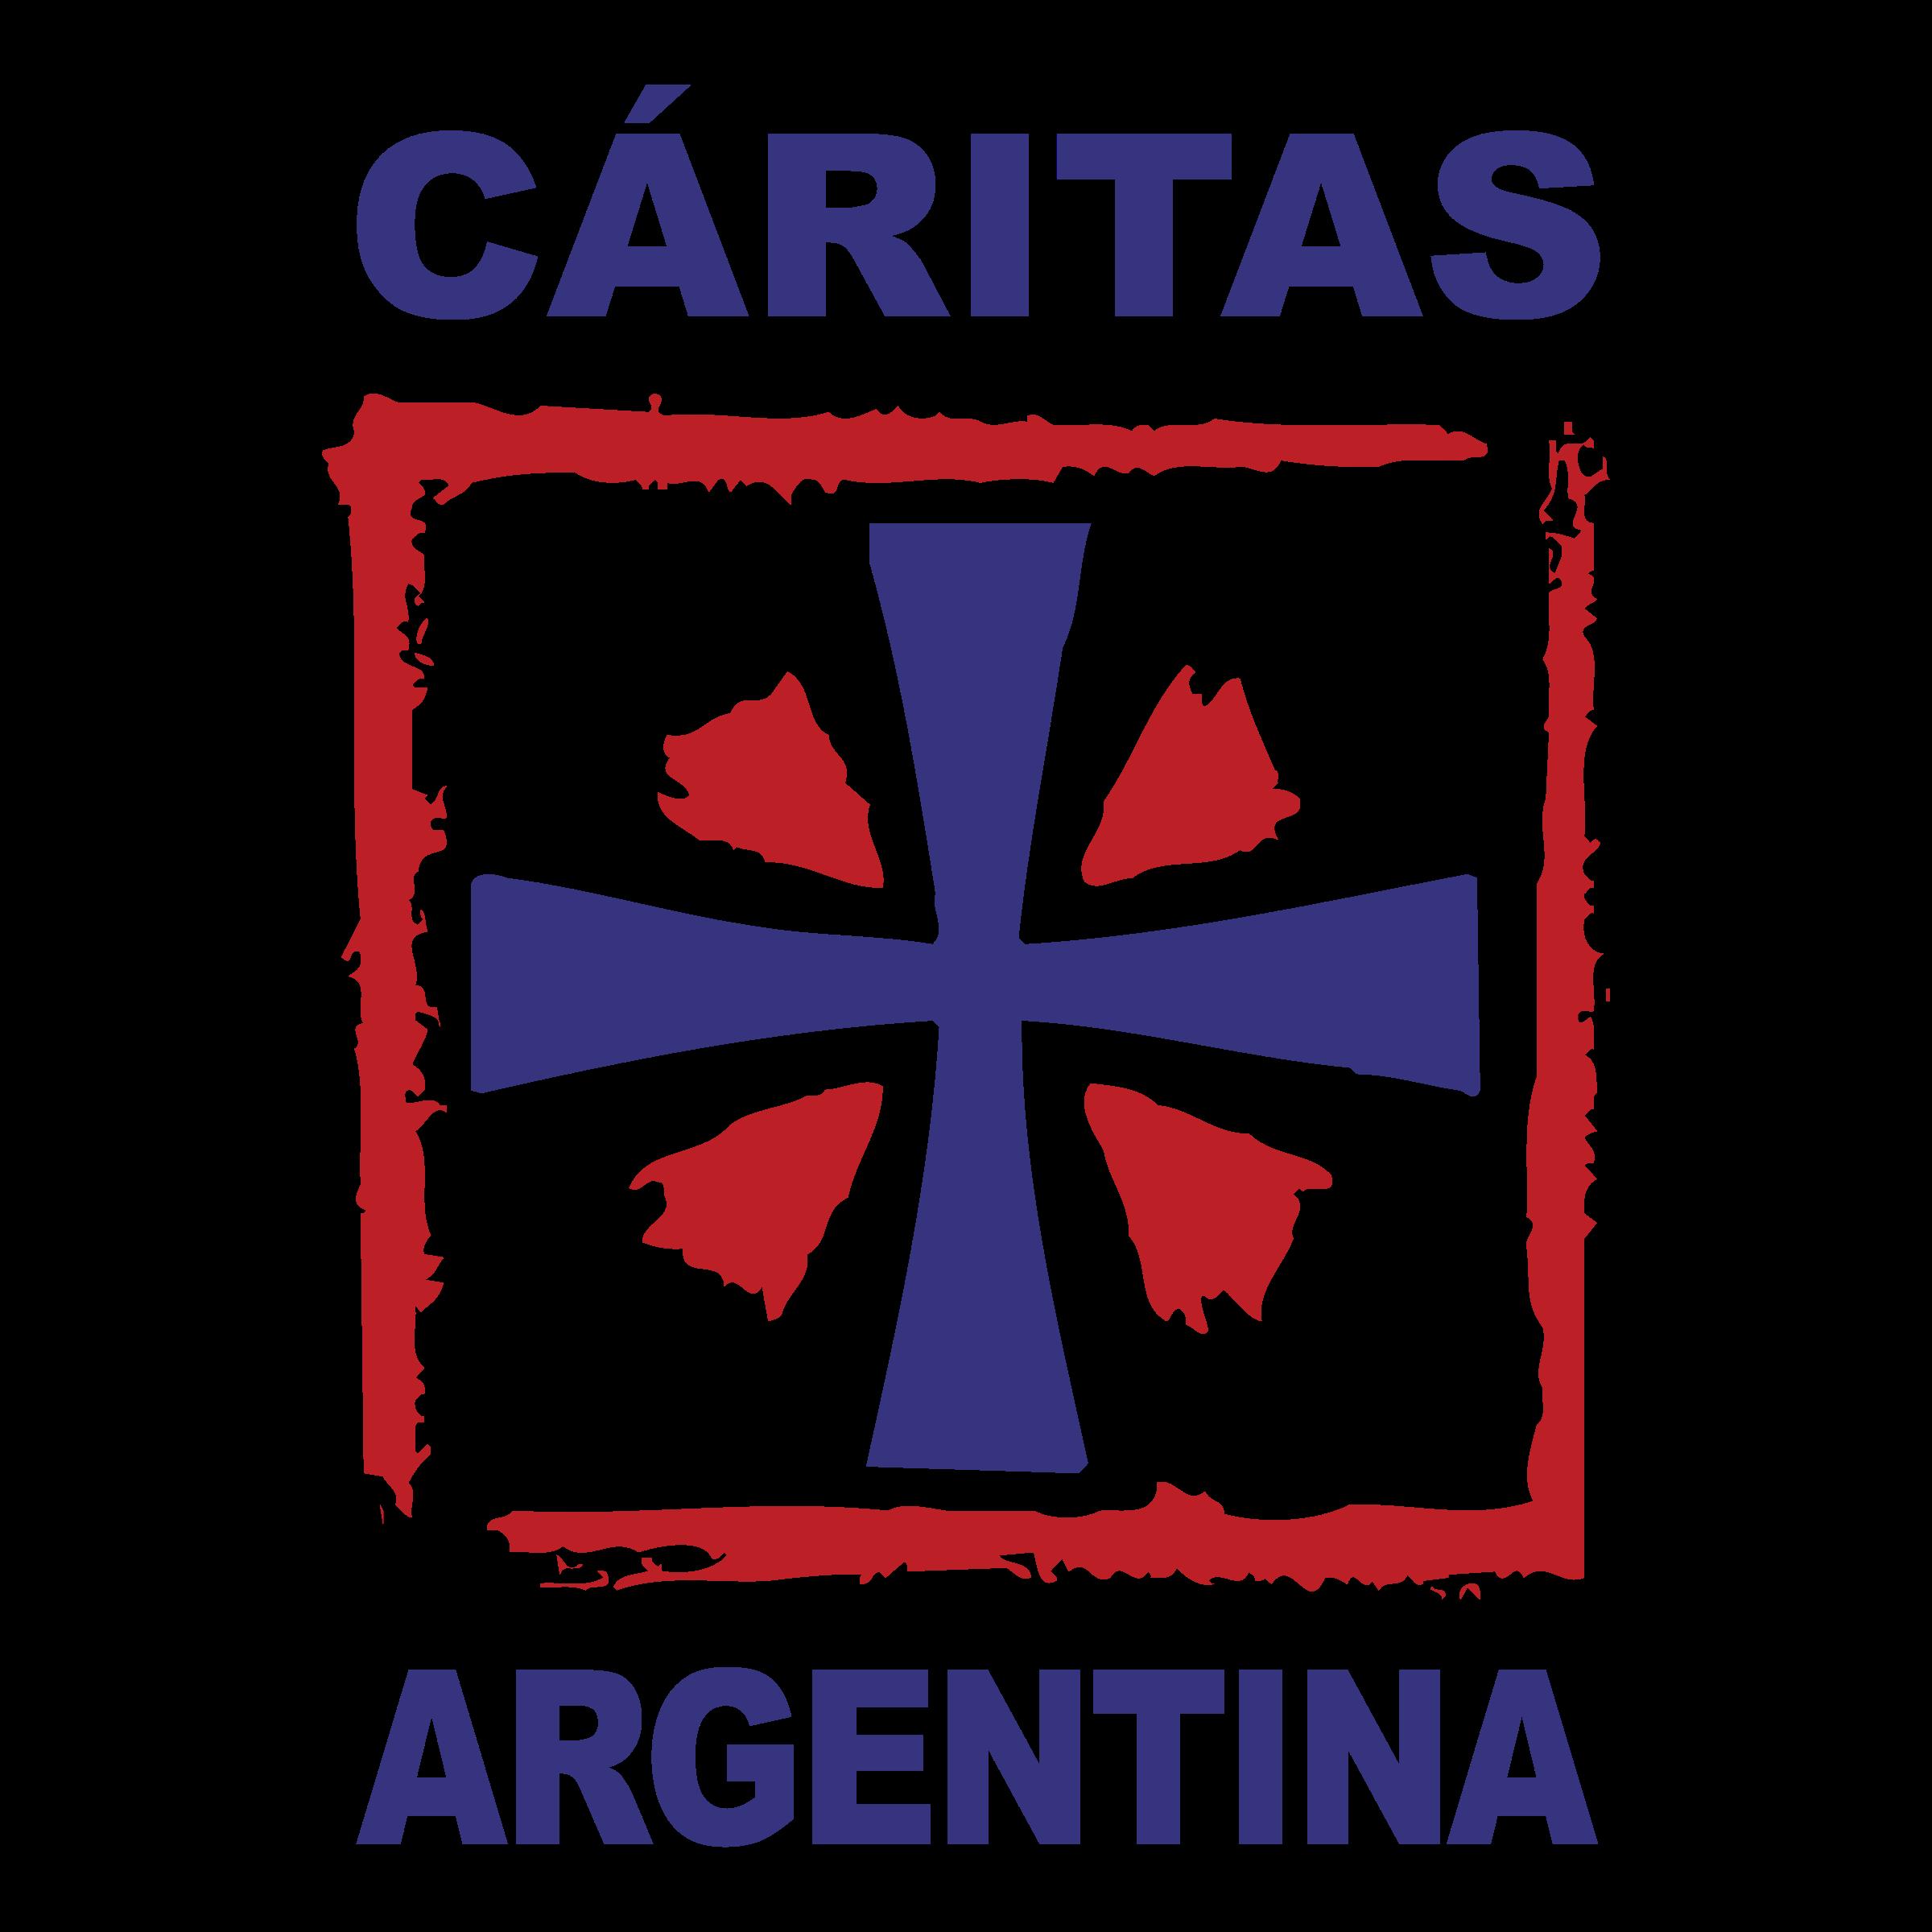 Caritas Argentina Logo PNG Transparent & SVG Vector.